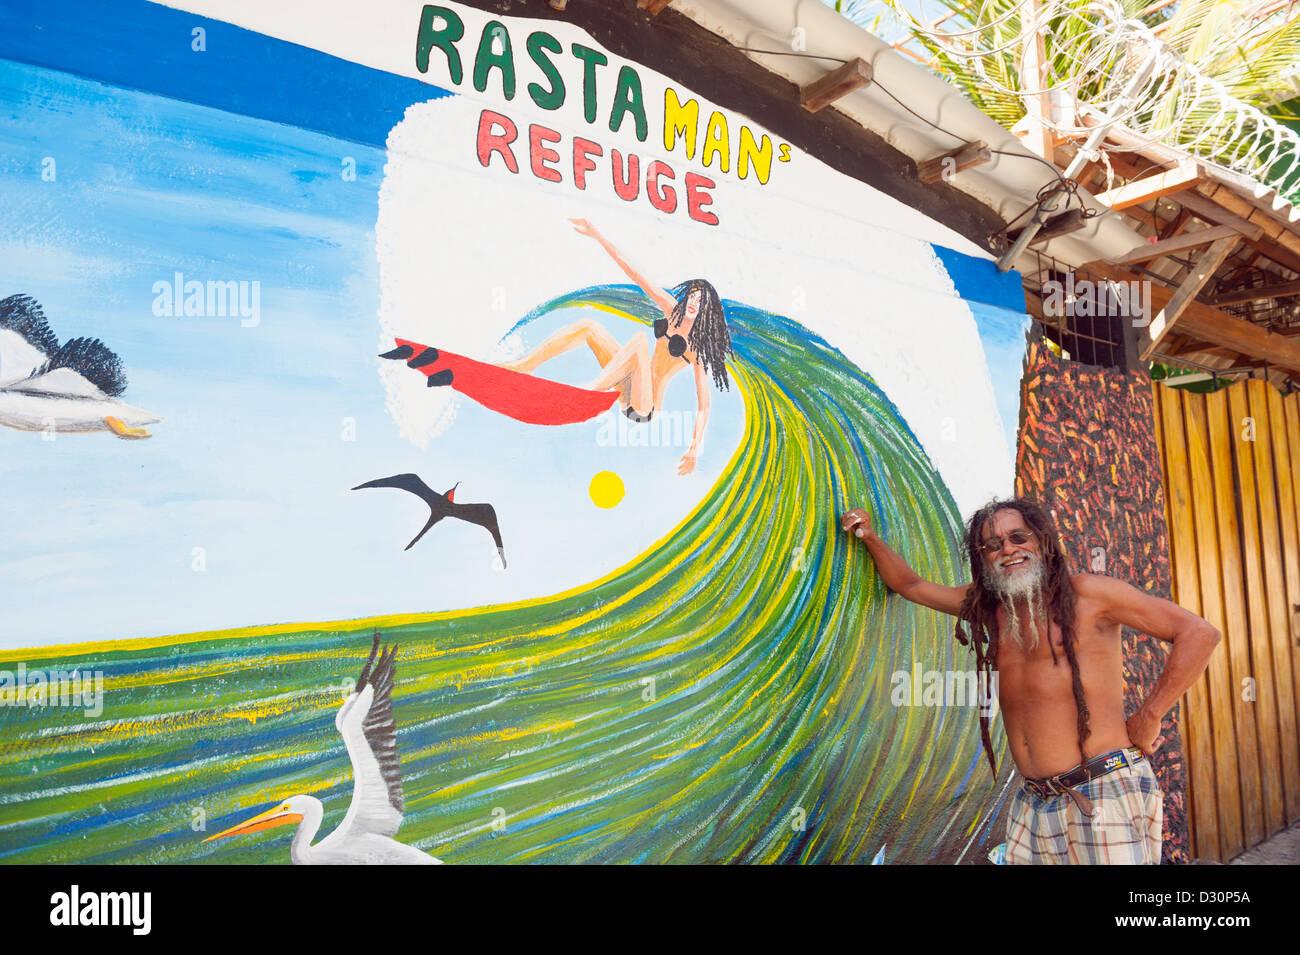 wall painting at Rasta Man Refuge, Pacific Coast, El Salvador, Central America - Stock Image